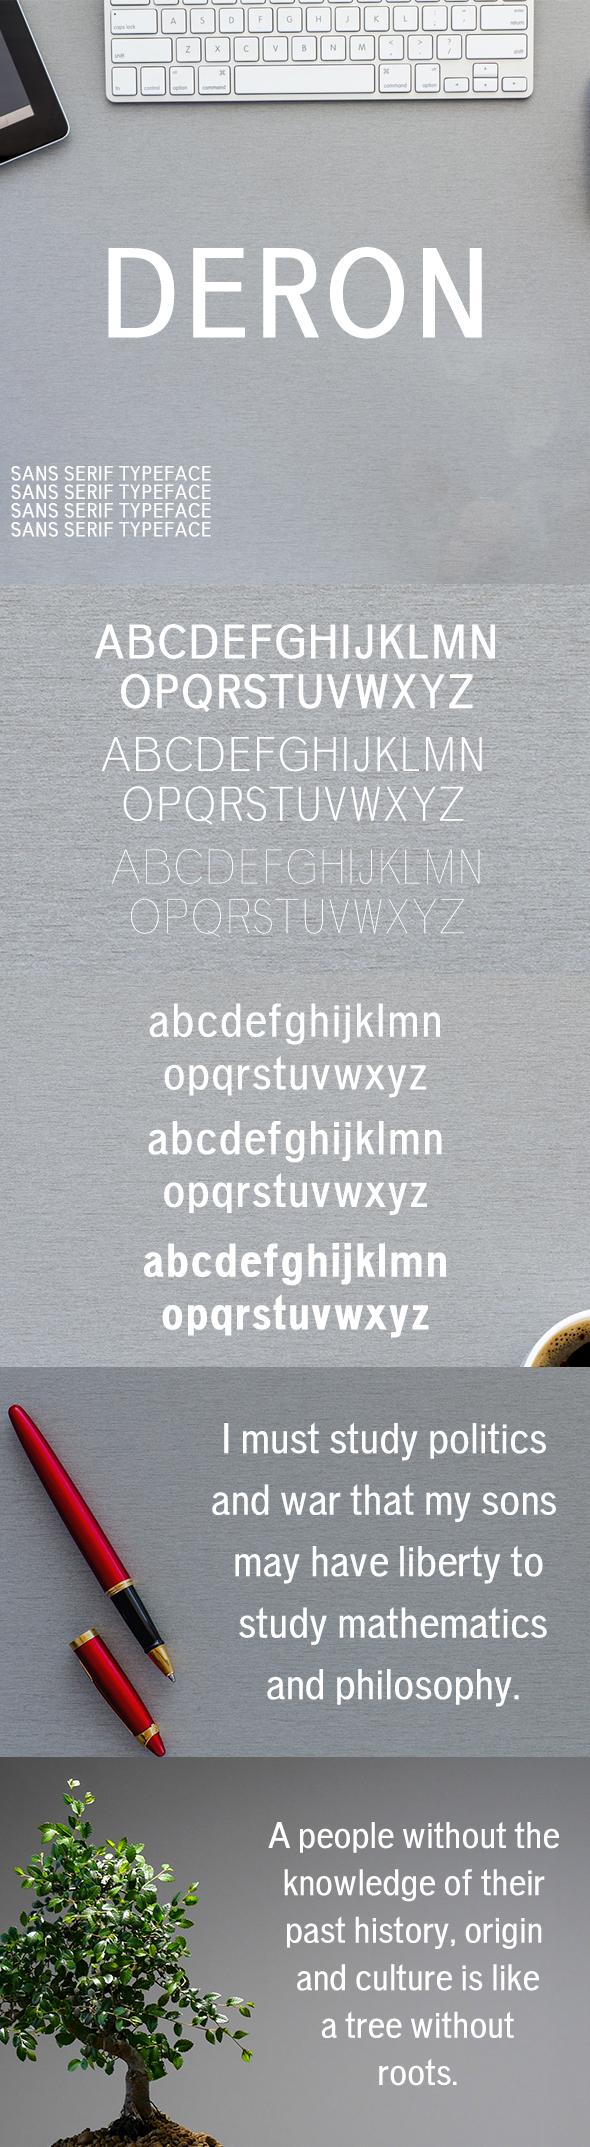 Deron Sans Serif Typeface - Sans-Serif Fonts